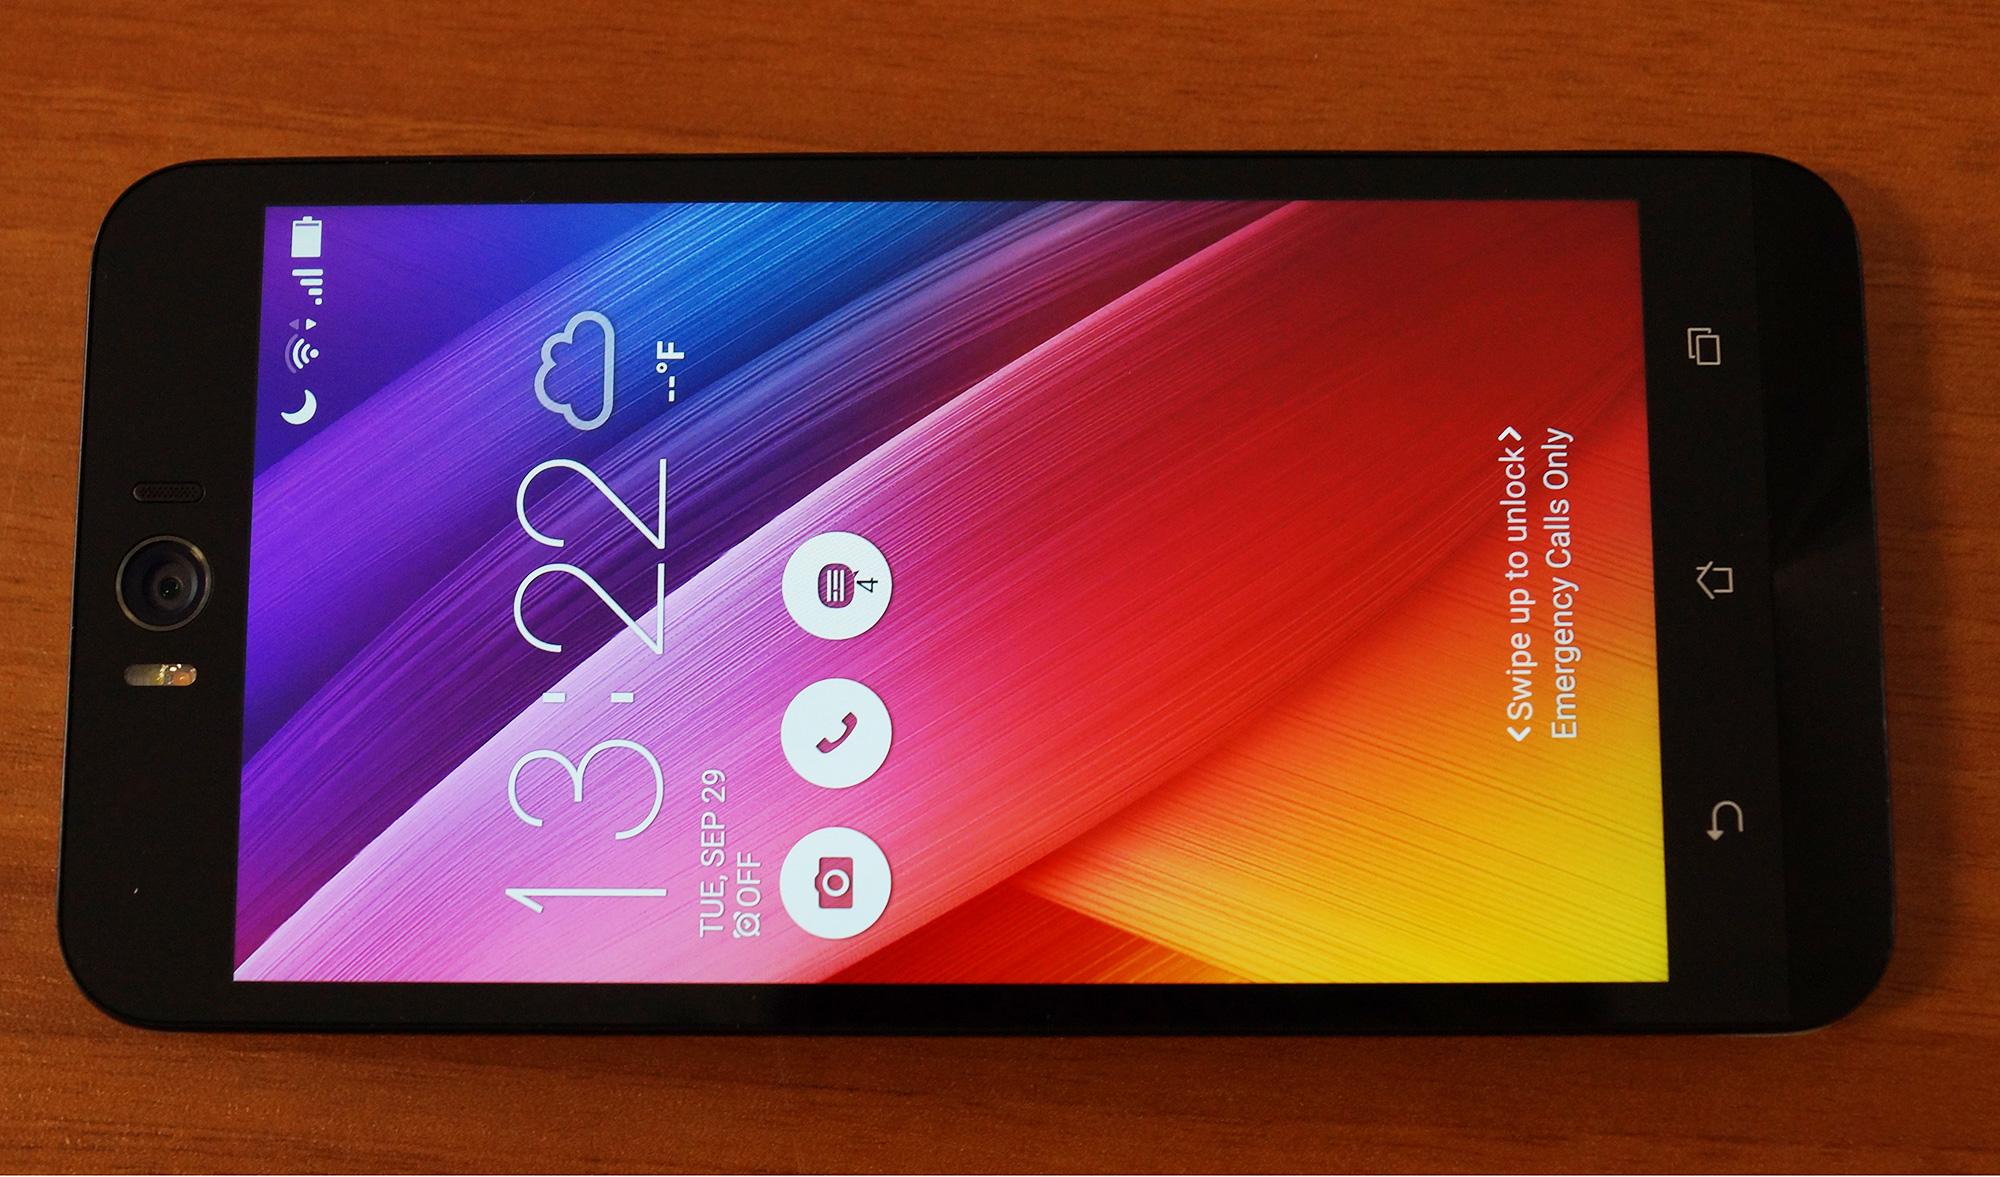 Asus Zenfone Selfie Review More Than Just Fabulous Shots 2 Ze551ml 2gb 16 99